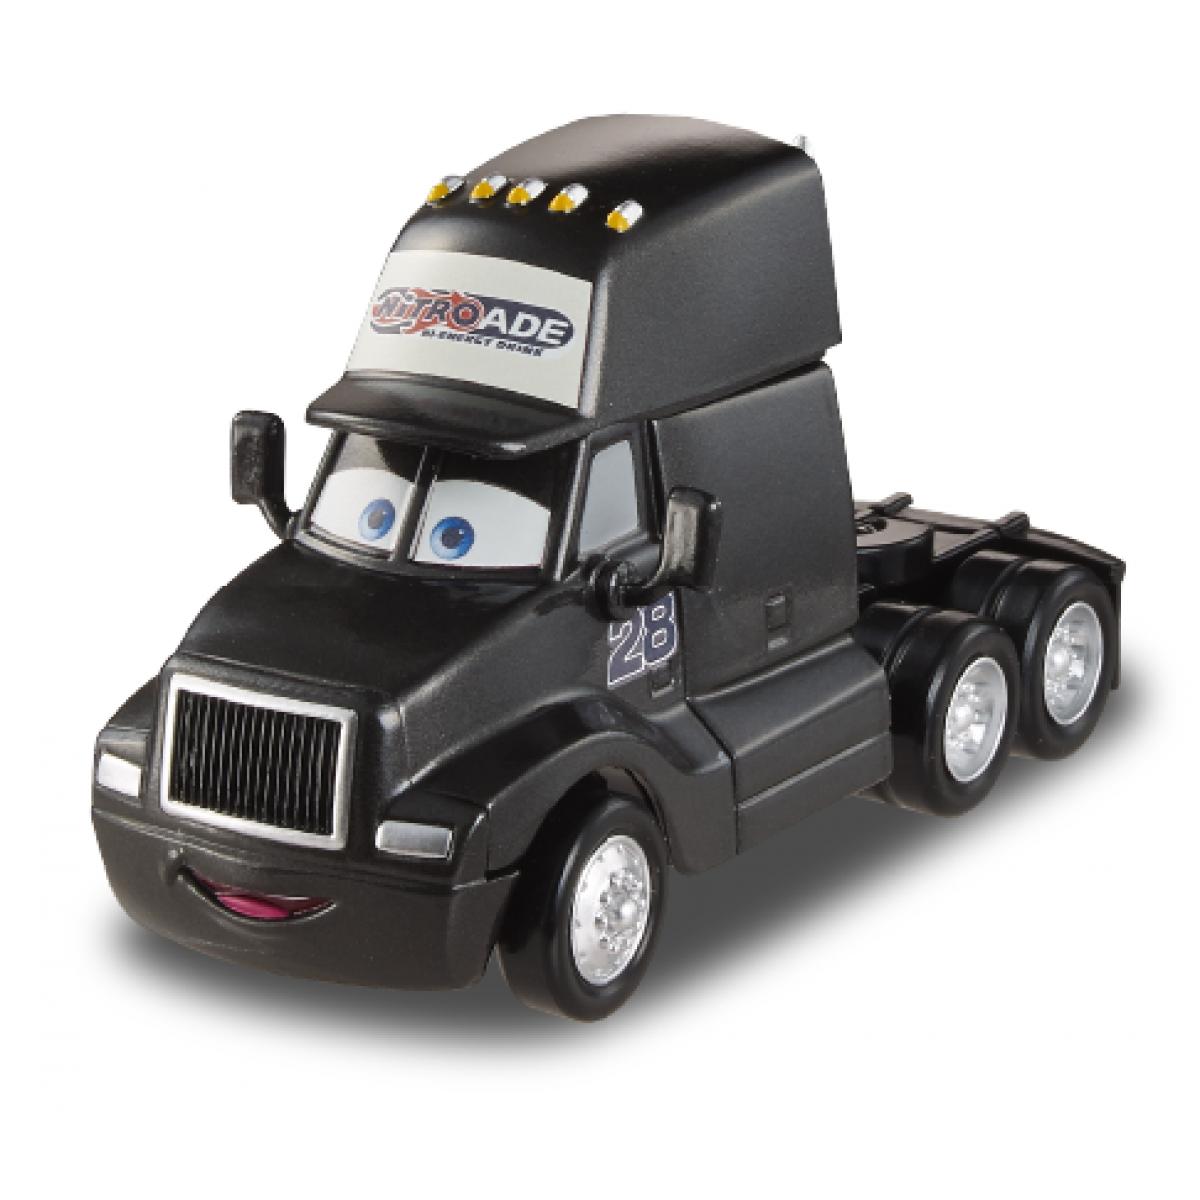 Cars Velká auta Mattel Y0539 - Eric Roadales